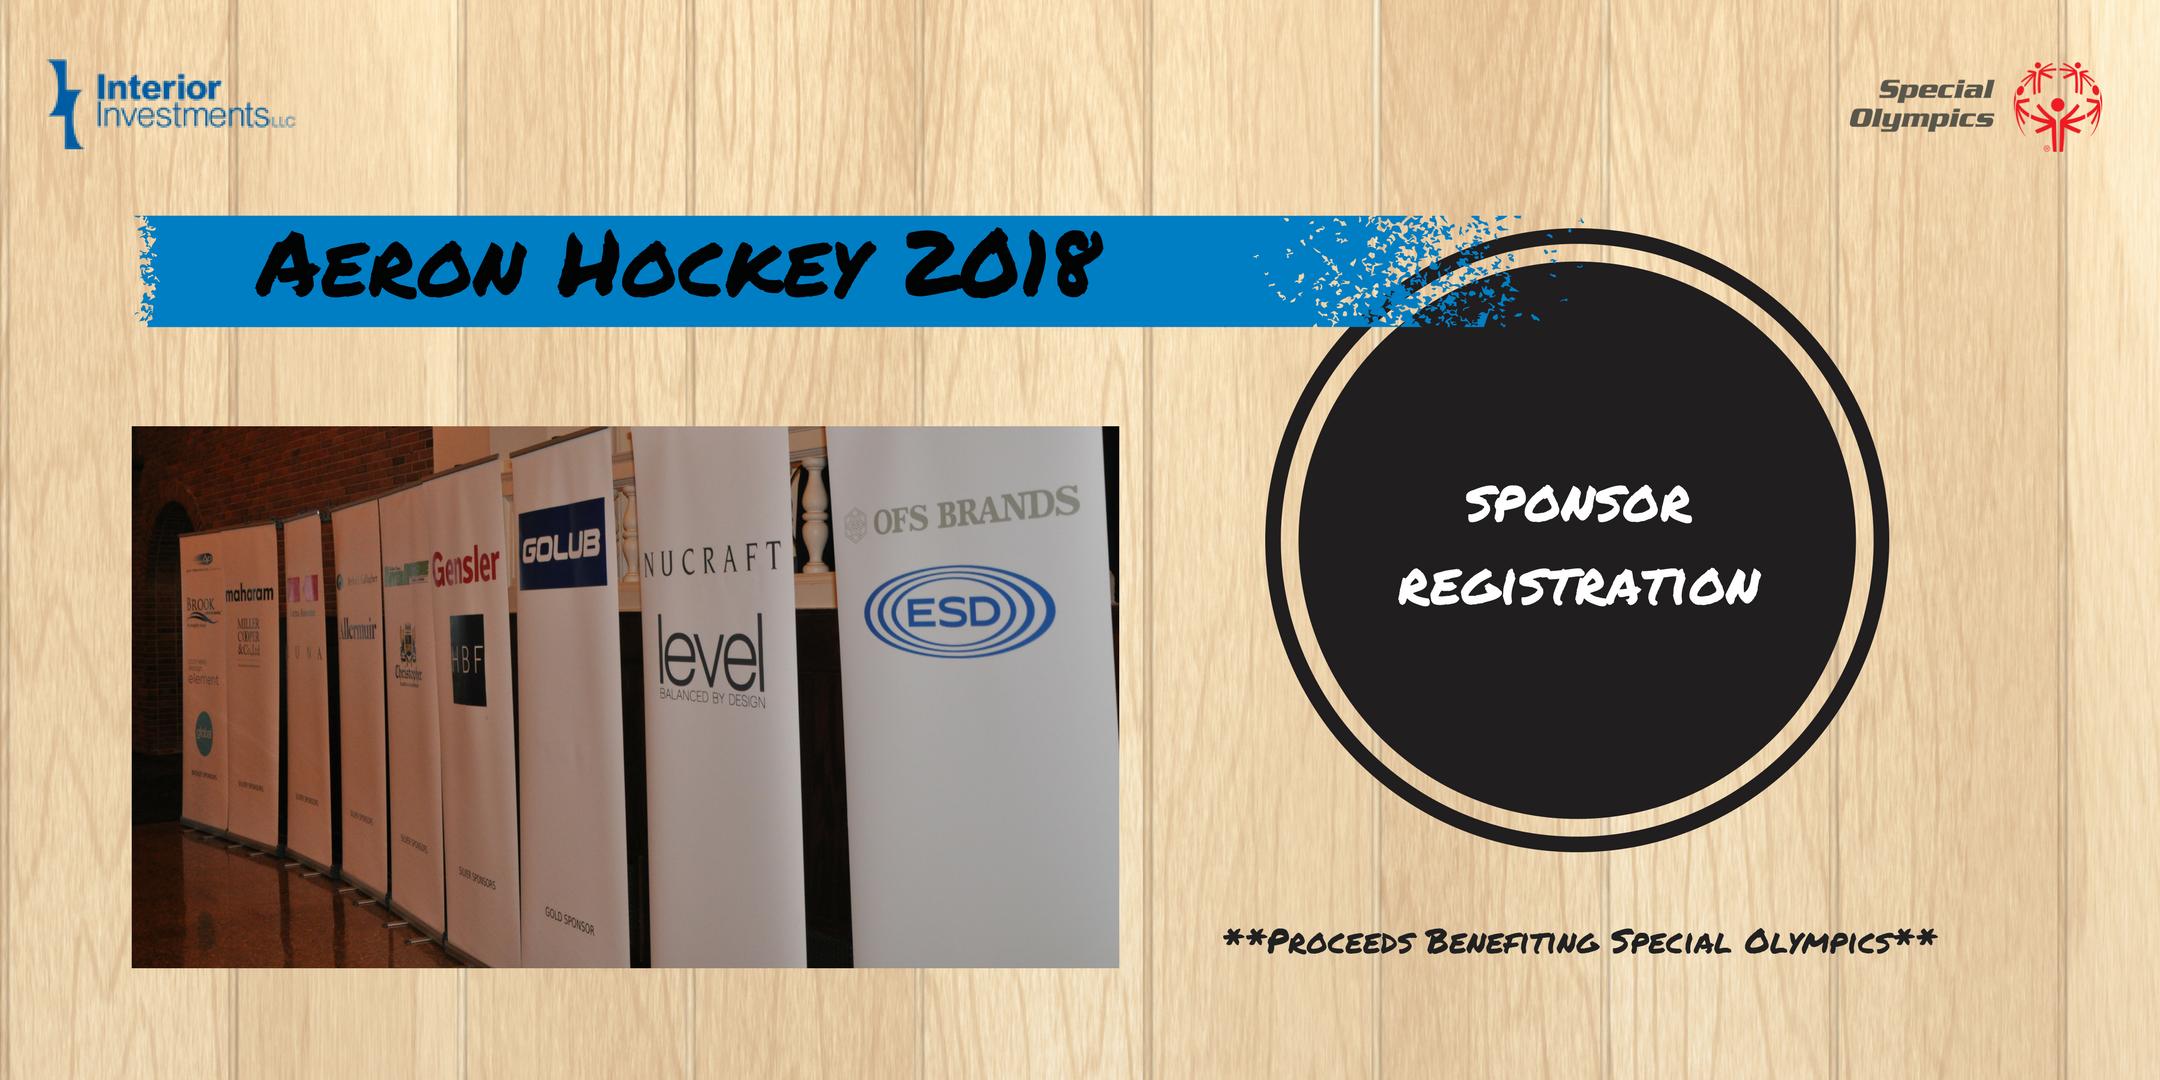 12th Annual Aeron Hockey Sponsorships